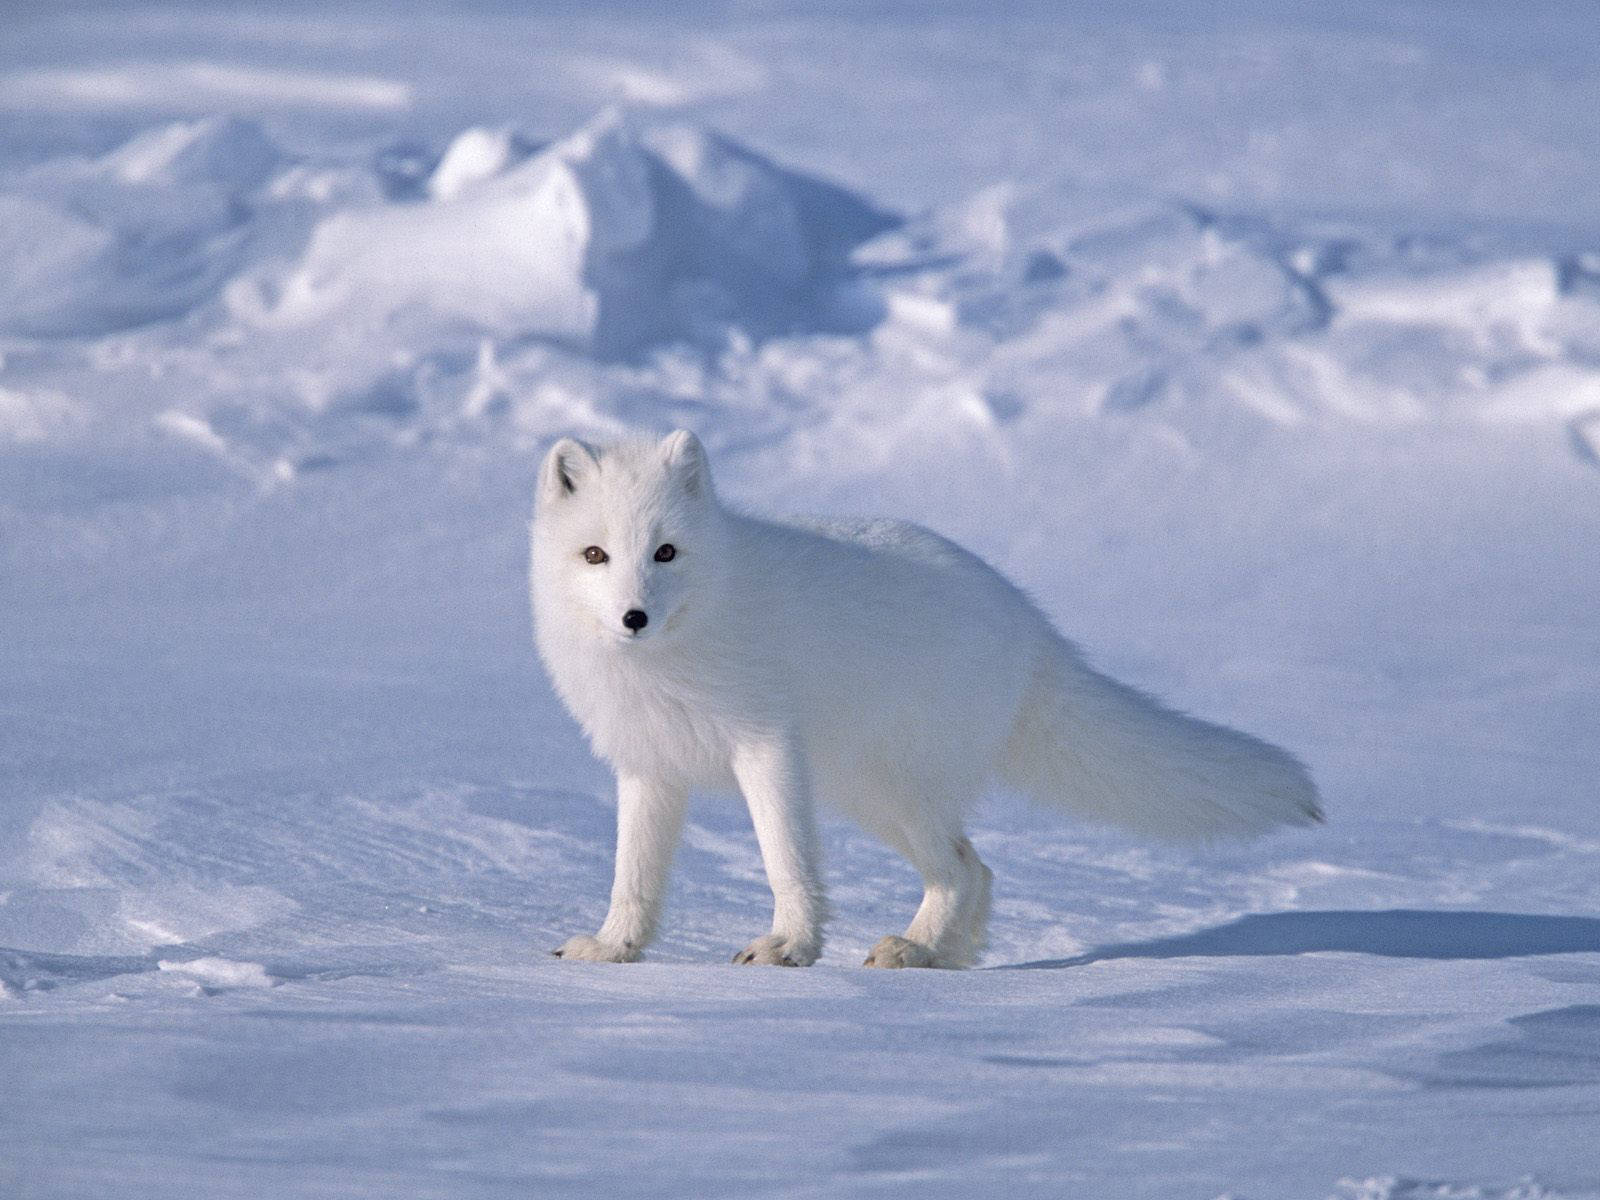 Free Arctic Fox Wallpaper 20051 1600x1200 px